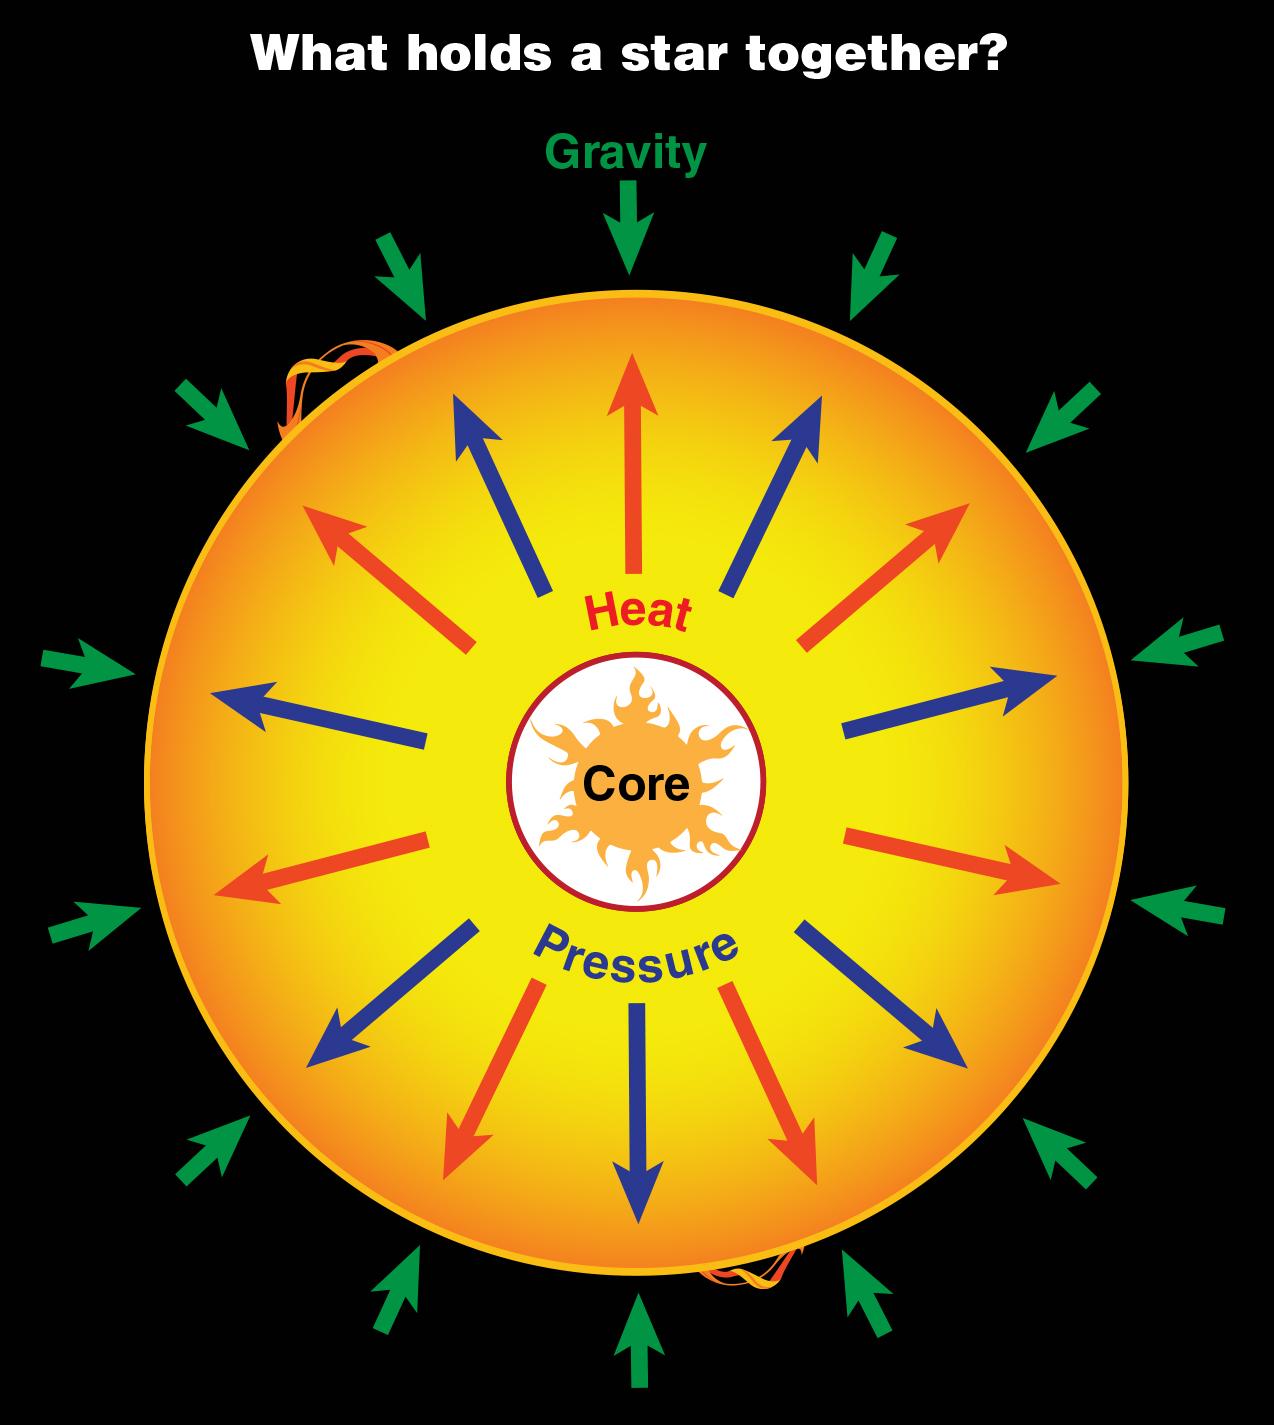 Colapso gravitatorio